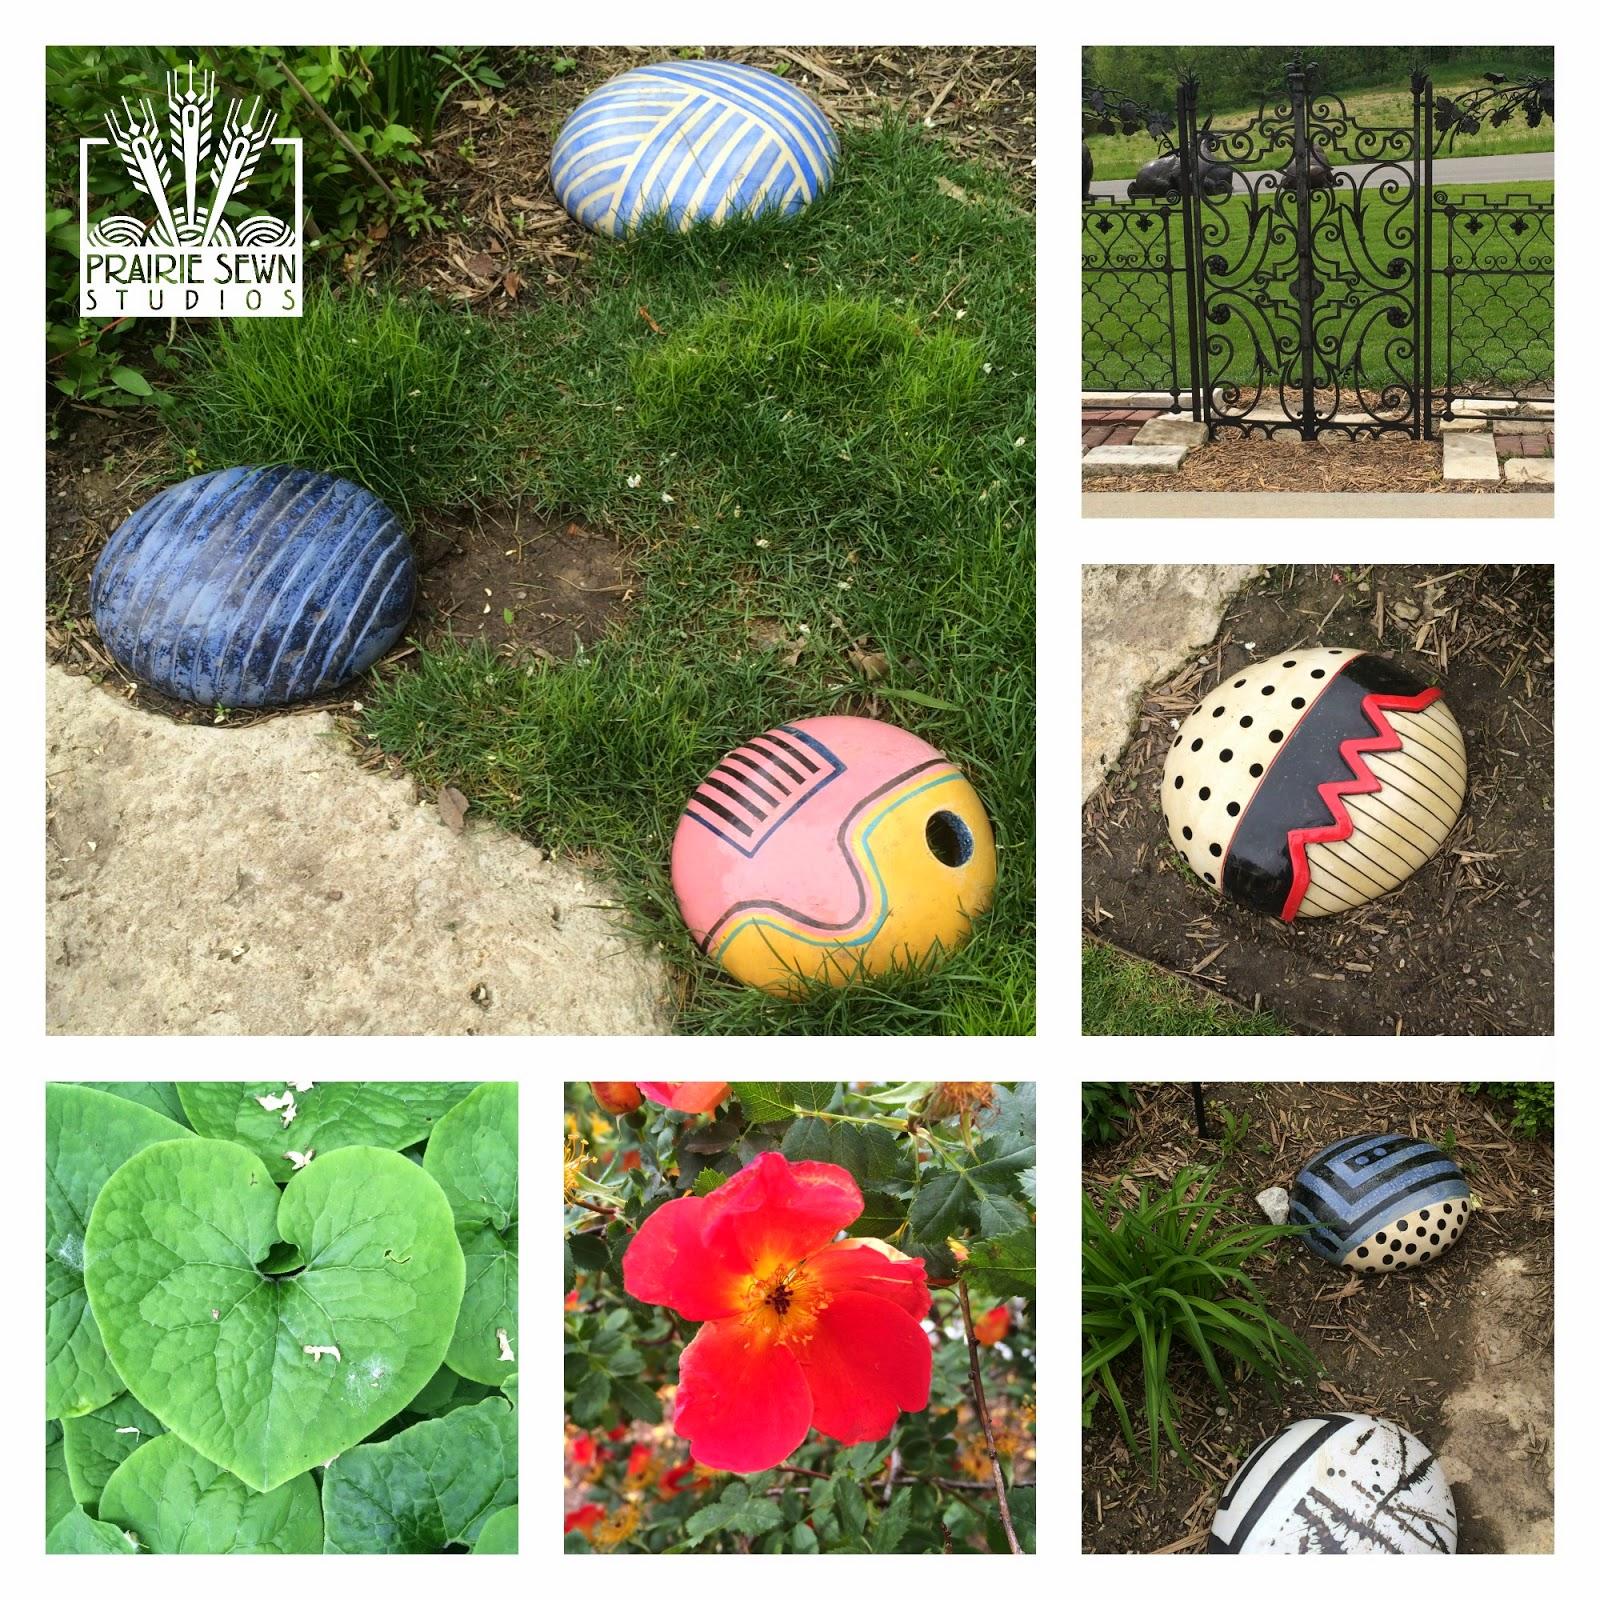 Inspiration from Lauritzen Gardens